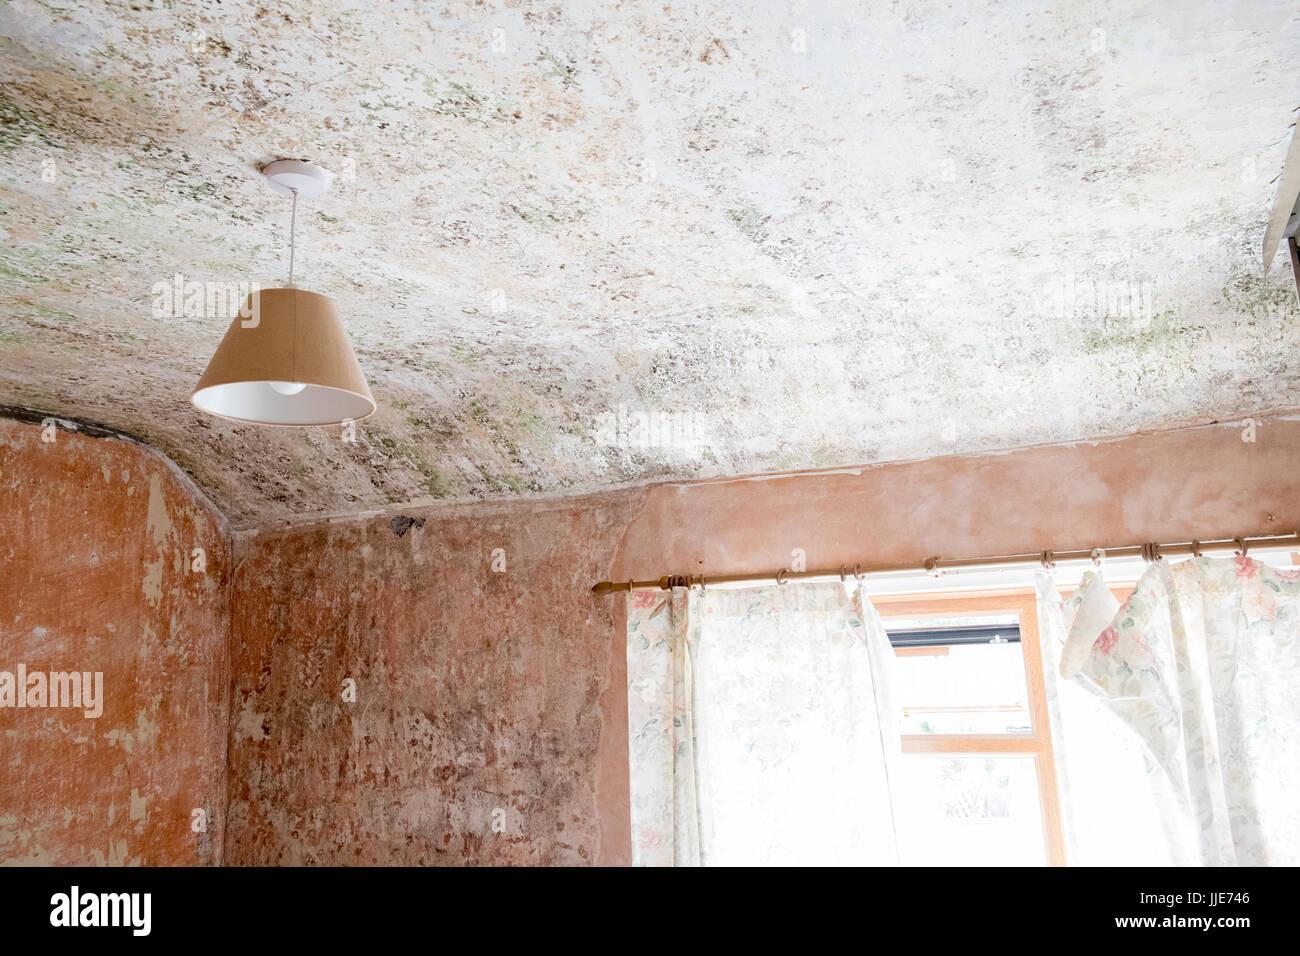 fliesen entfernen wand verputzen kellertreppe wand verputzen. Black Bedroom Furniture Sets. Home Design Ideas